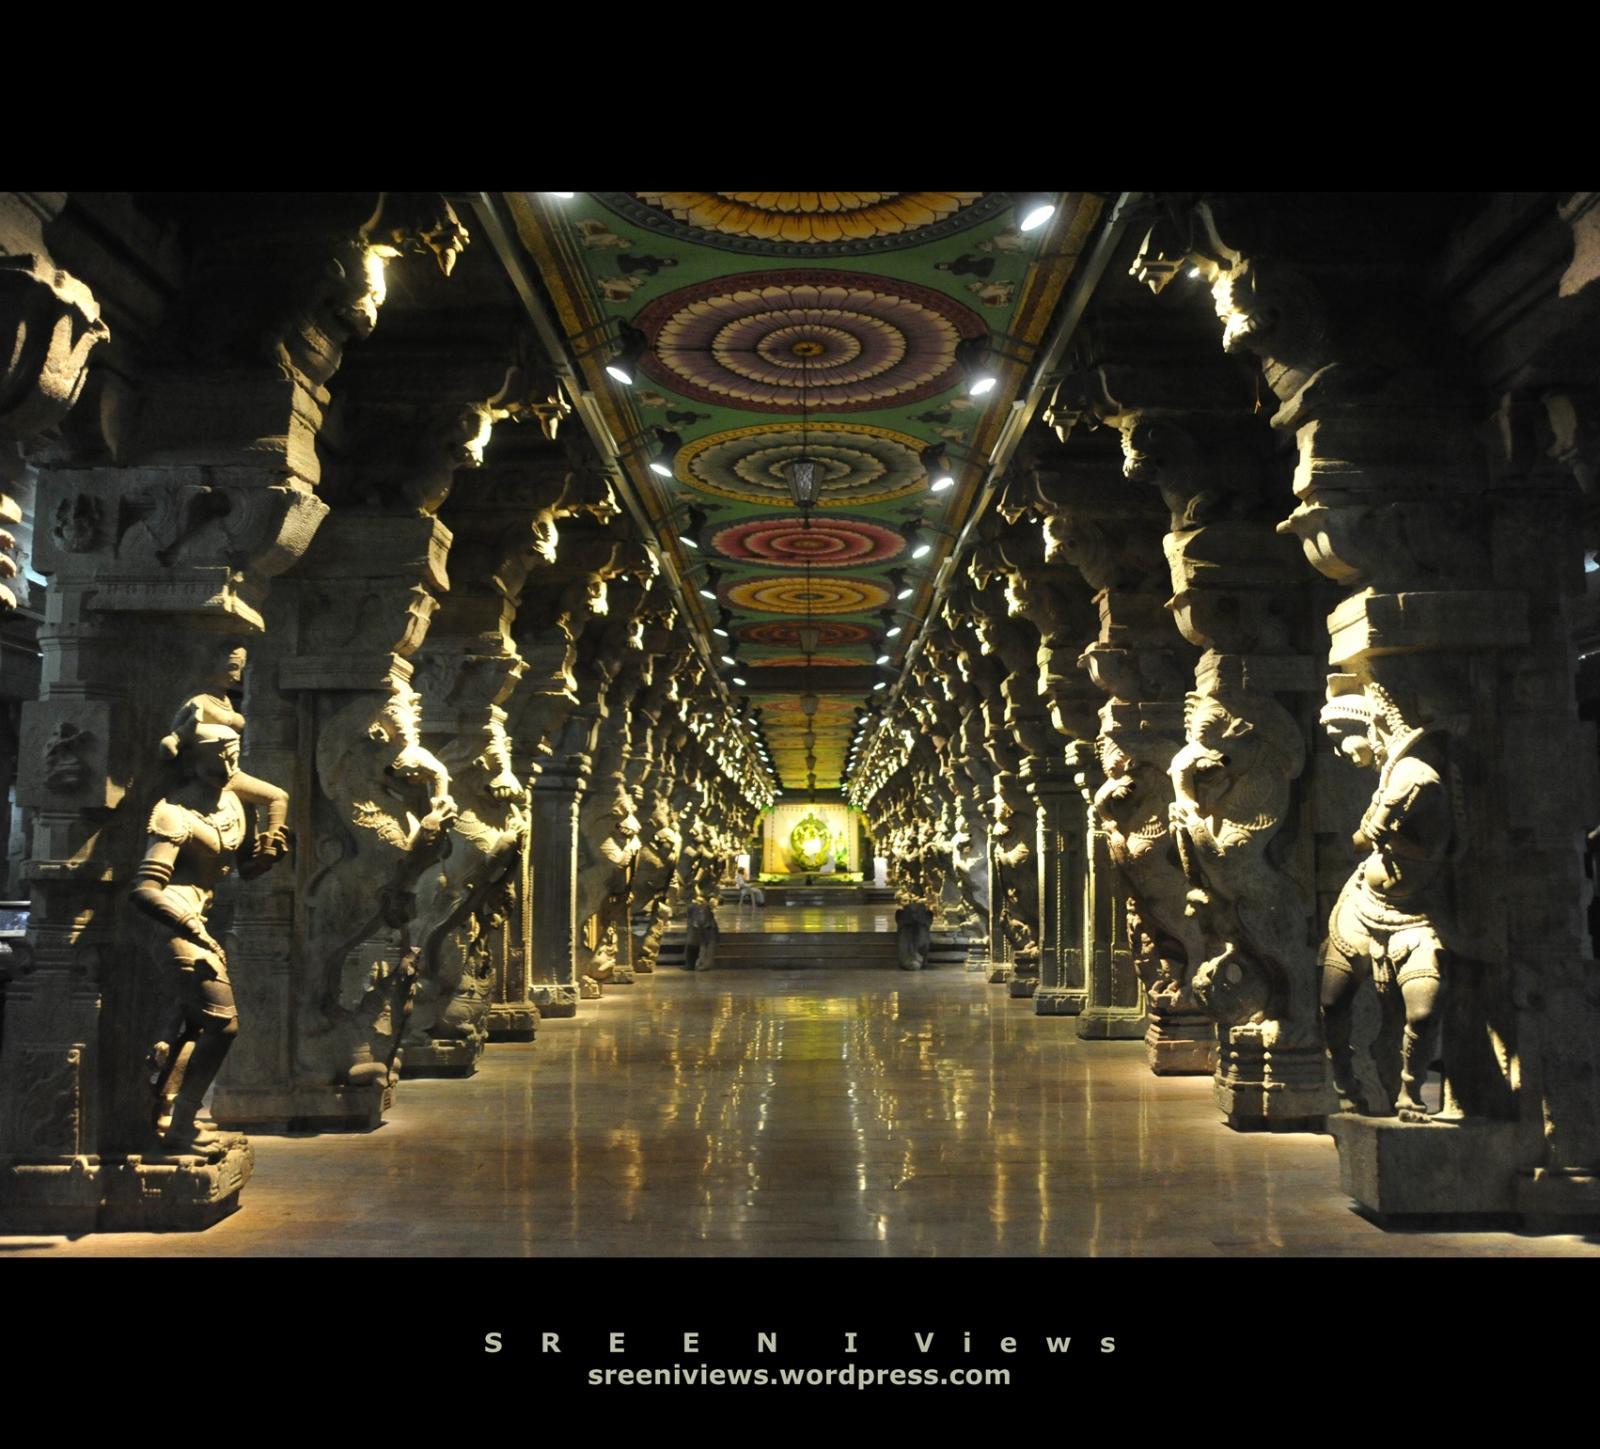 Incredible India! Marvelous Madurai, 1000 pillar temple